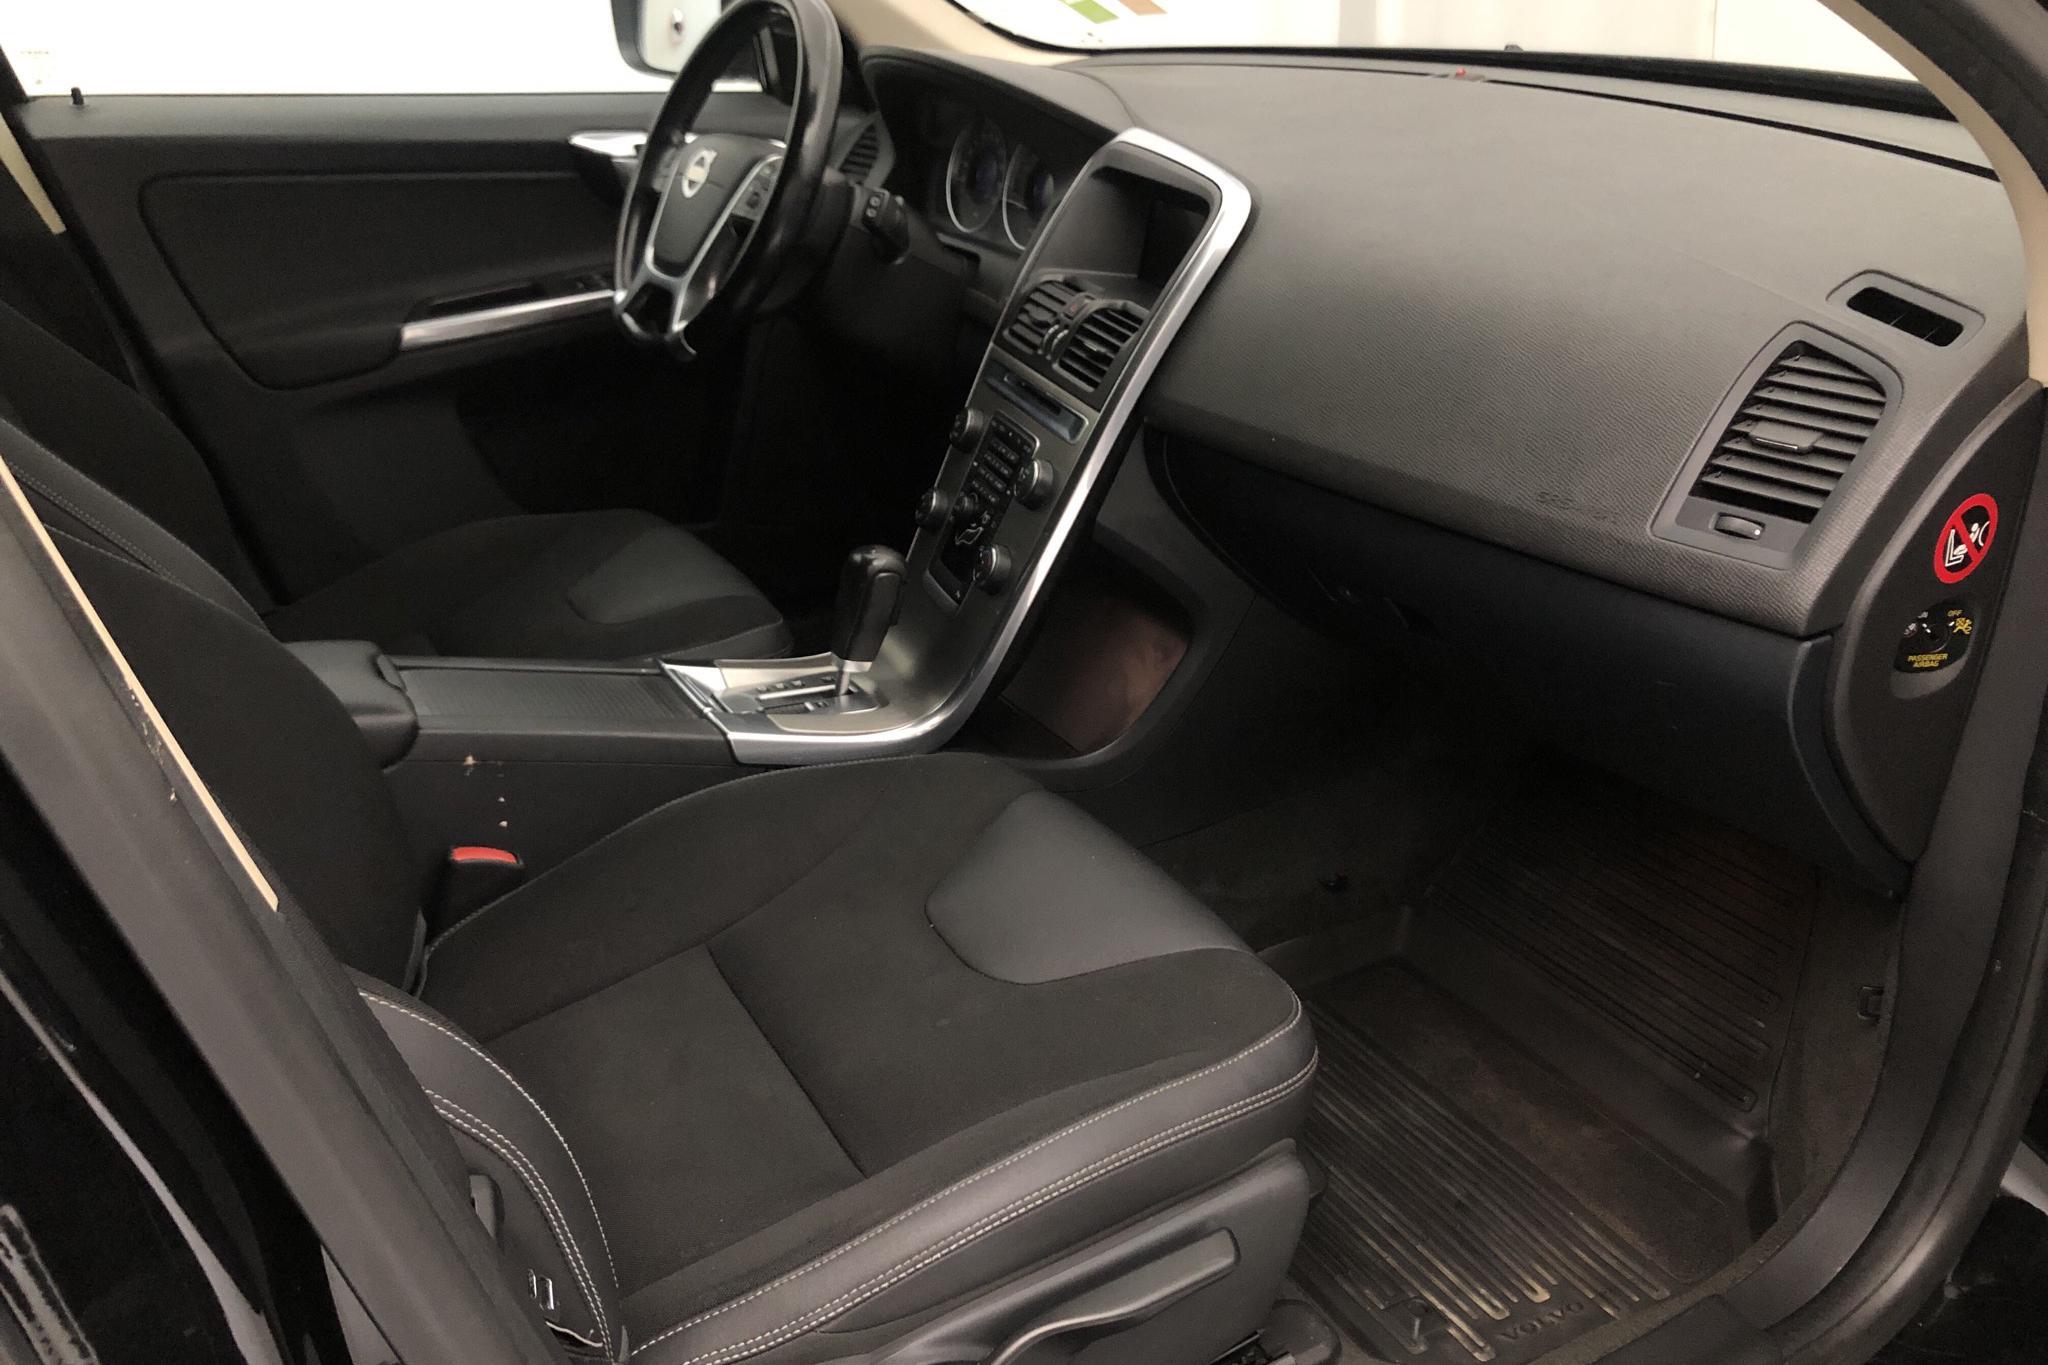 Volvo XC60 D3 2WD (163hk) - 172 980 km - Automatic - black - 2012